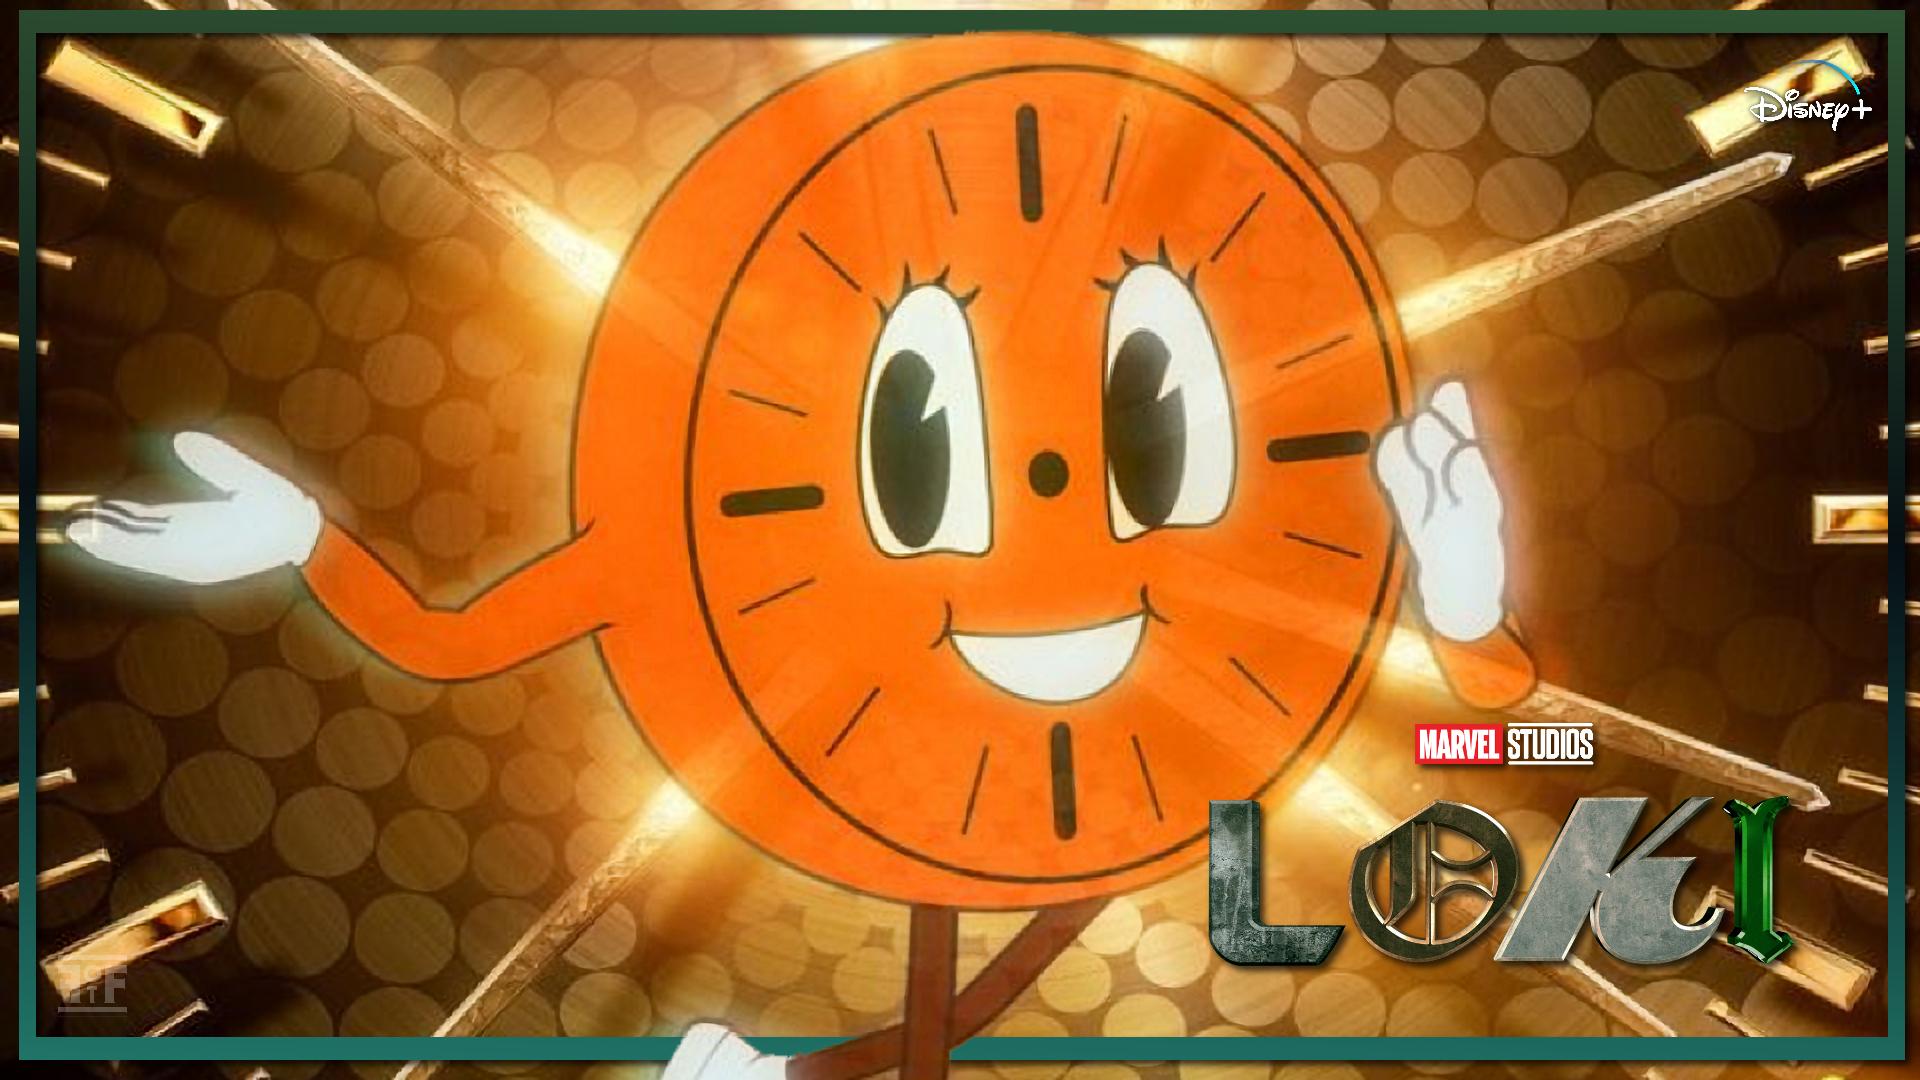 Marvel Studios' Loki | Miss Minutes Character Poster